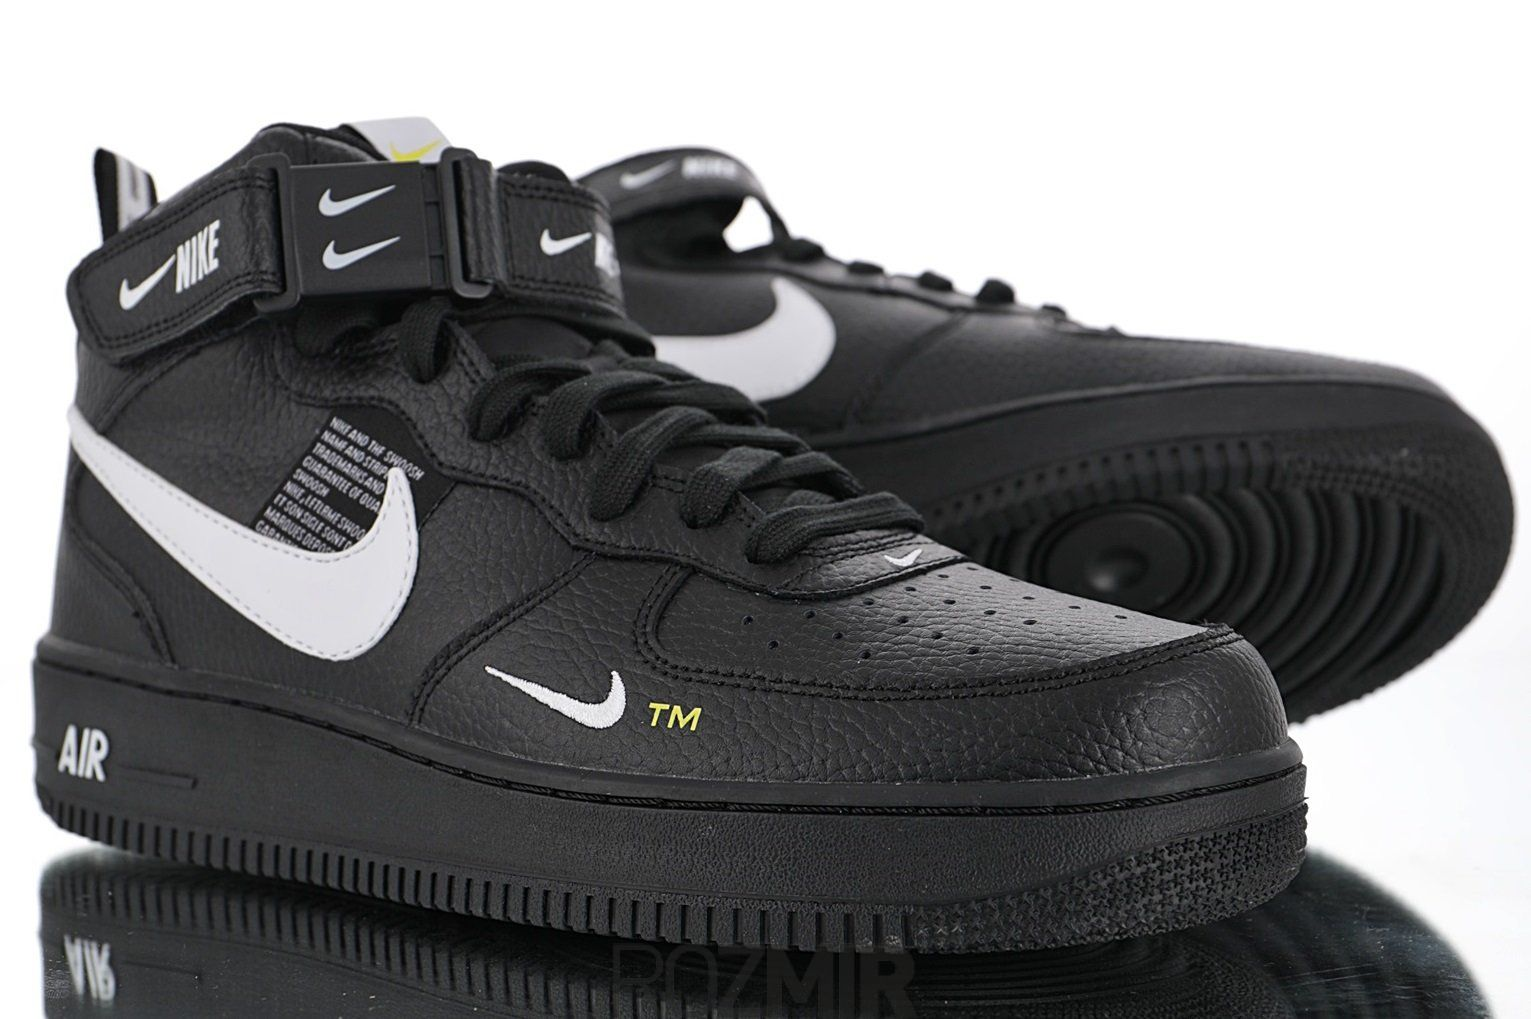 e10ce93f Мужские кроссовки Nike Air Force 1 Mid 07 LV8 Utility